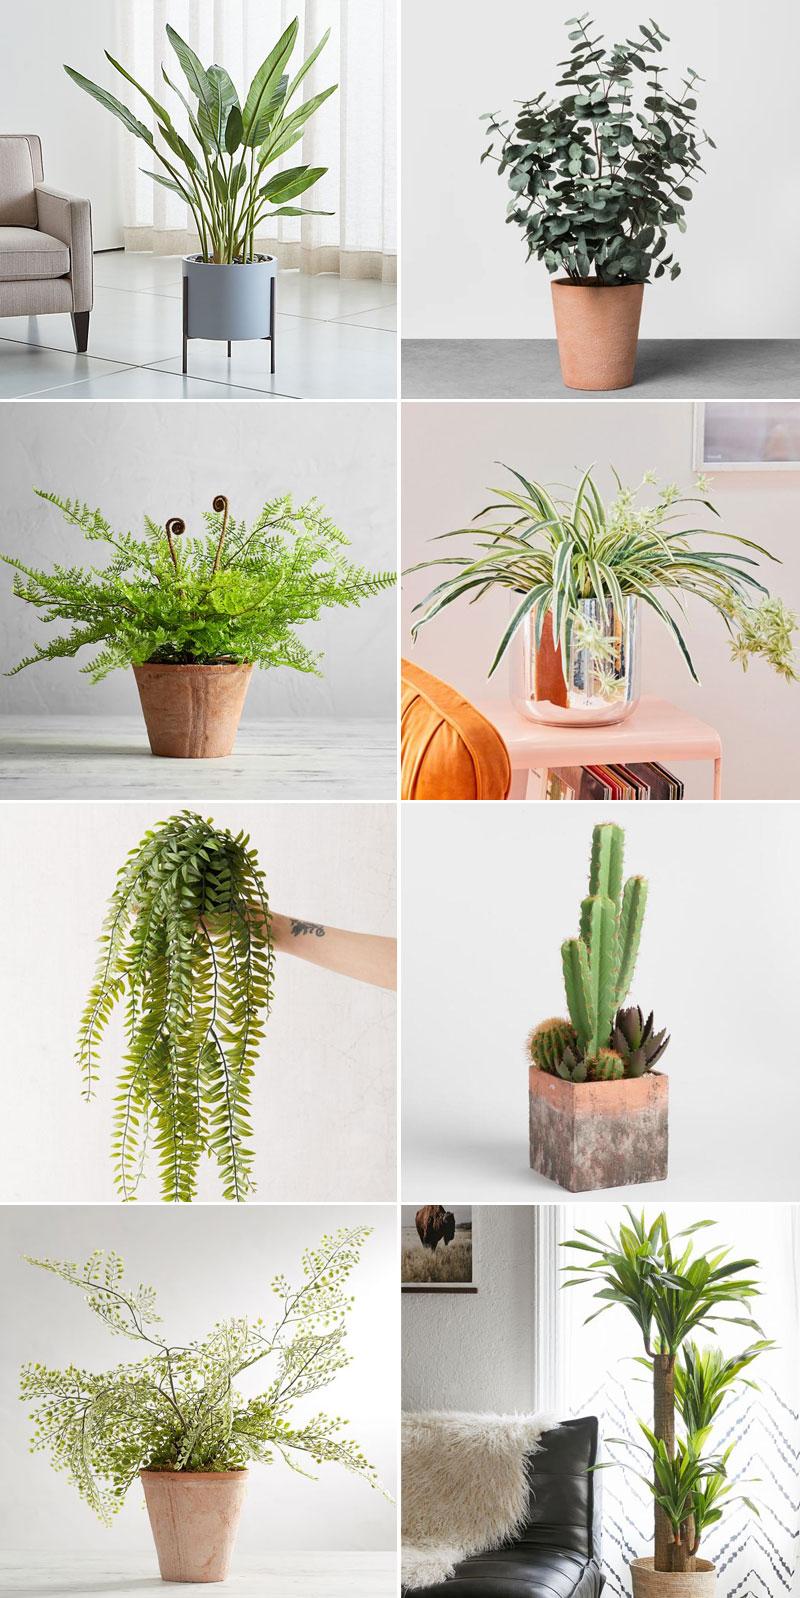 OMG... These Faux Indoor Plants are Shockingly Good & Convincing #plants #houseplants #lowlightplants #indoorgardening #smallspaces #tipsandtricks #tinyhome #decoratingwithplants #fauxplants #fakeplants #fakeindoorplants #fauxindoorplants